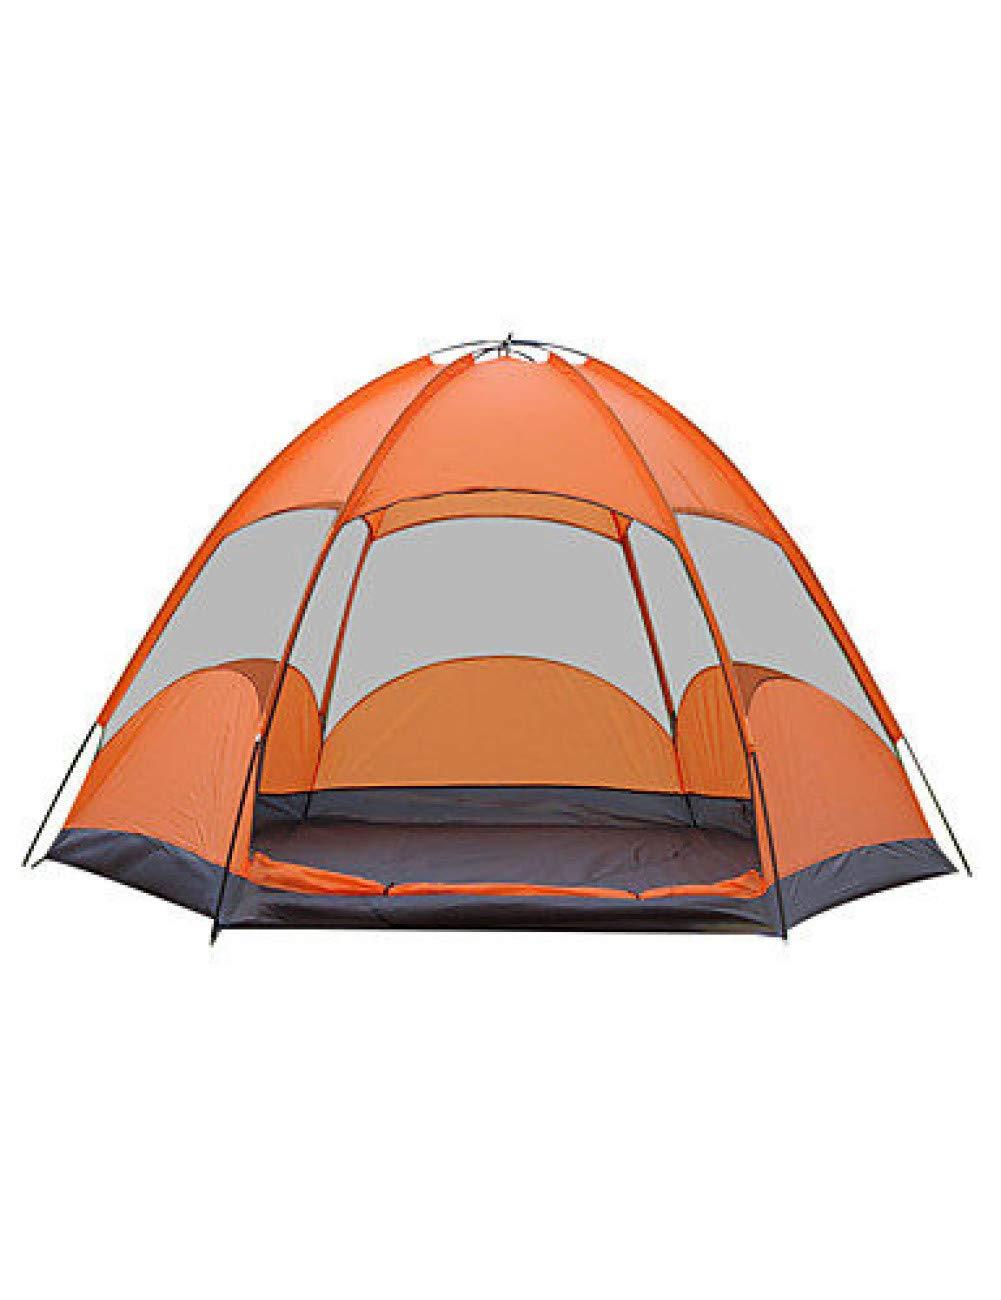 MDZH Carpa 3-4 Personas Pantalla Exterior Equip Hiking Camp Ultralight Tent TouristSuministros APrueba De Agua